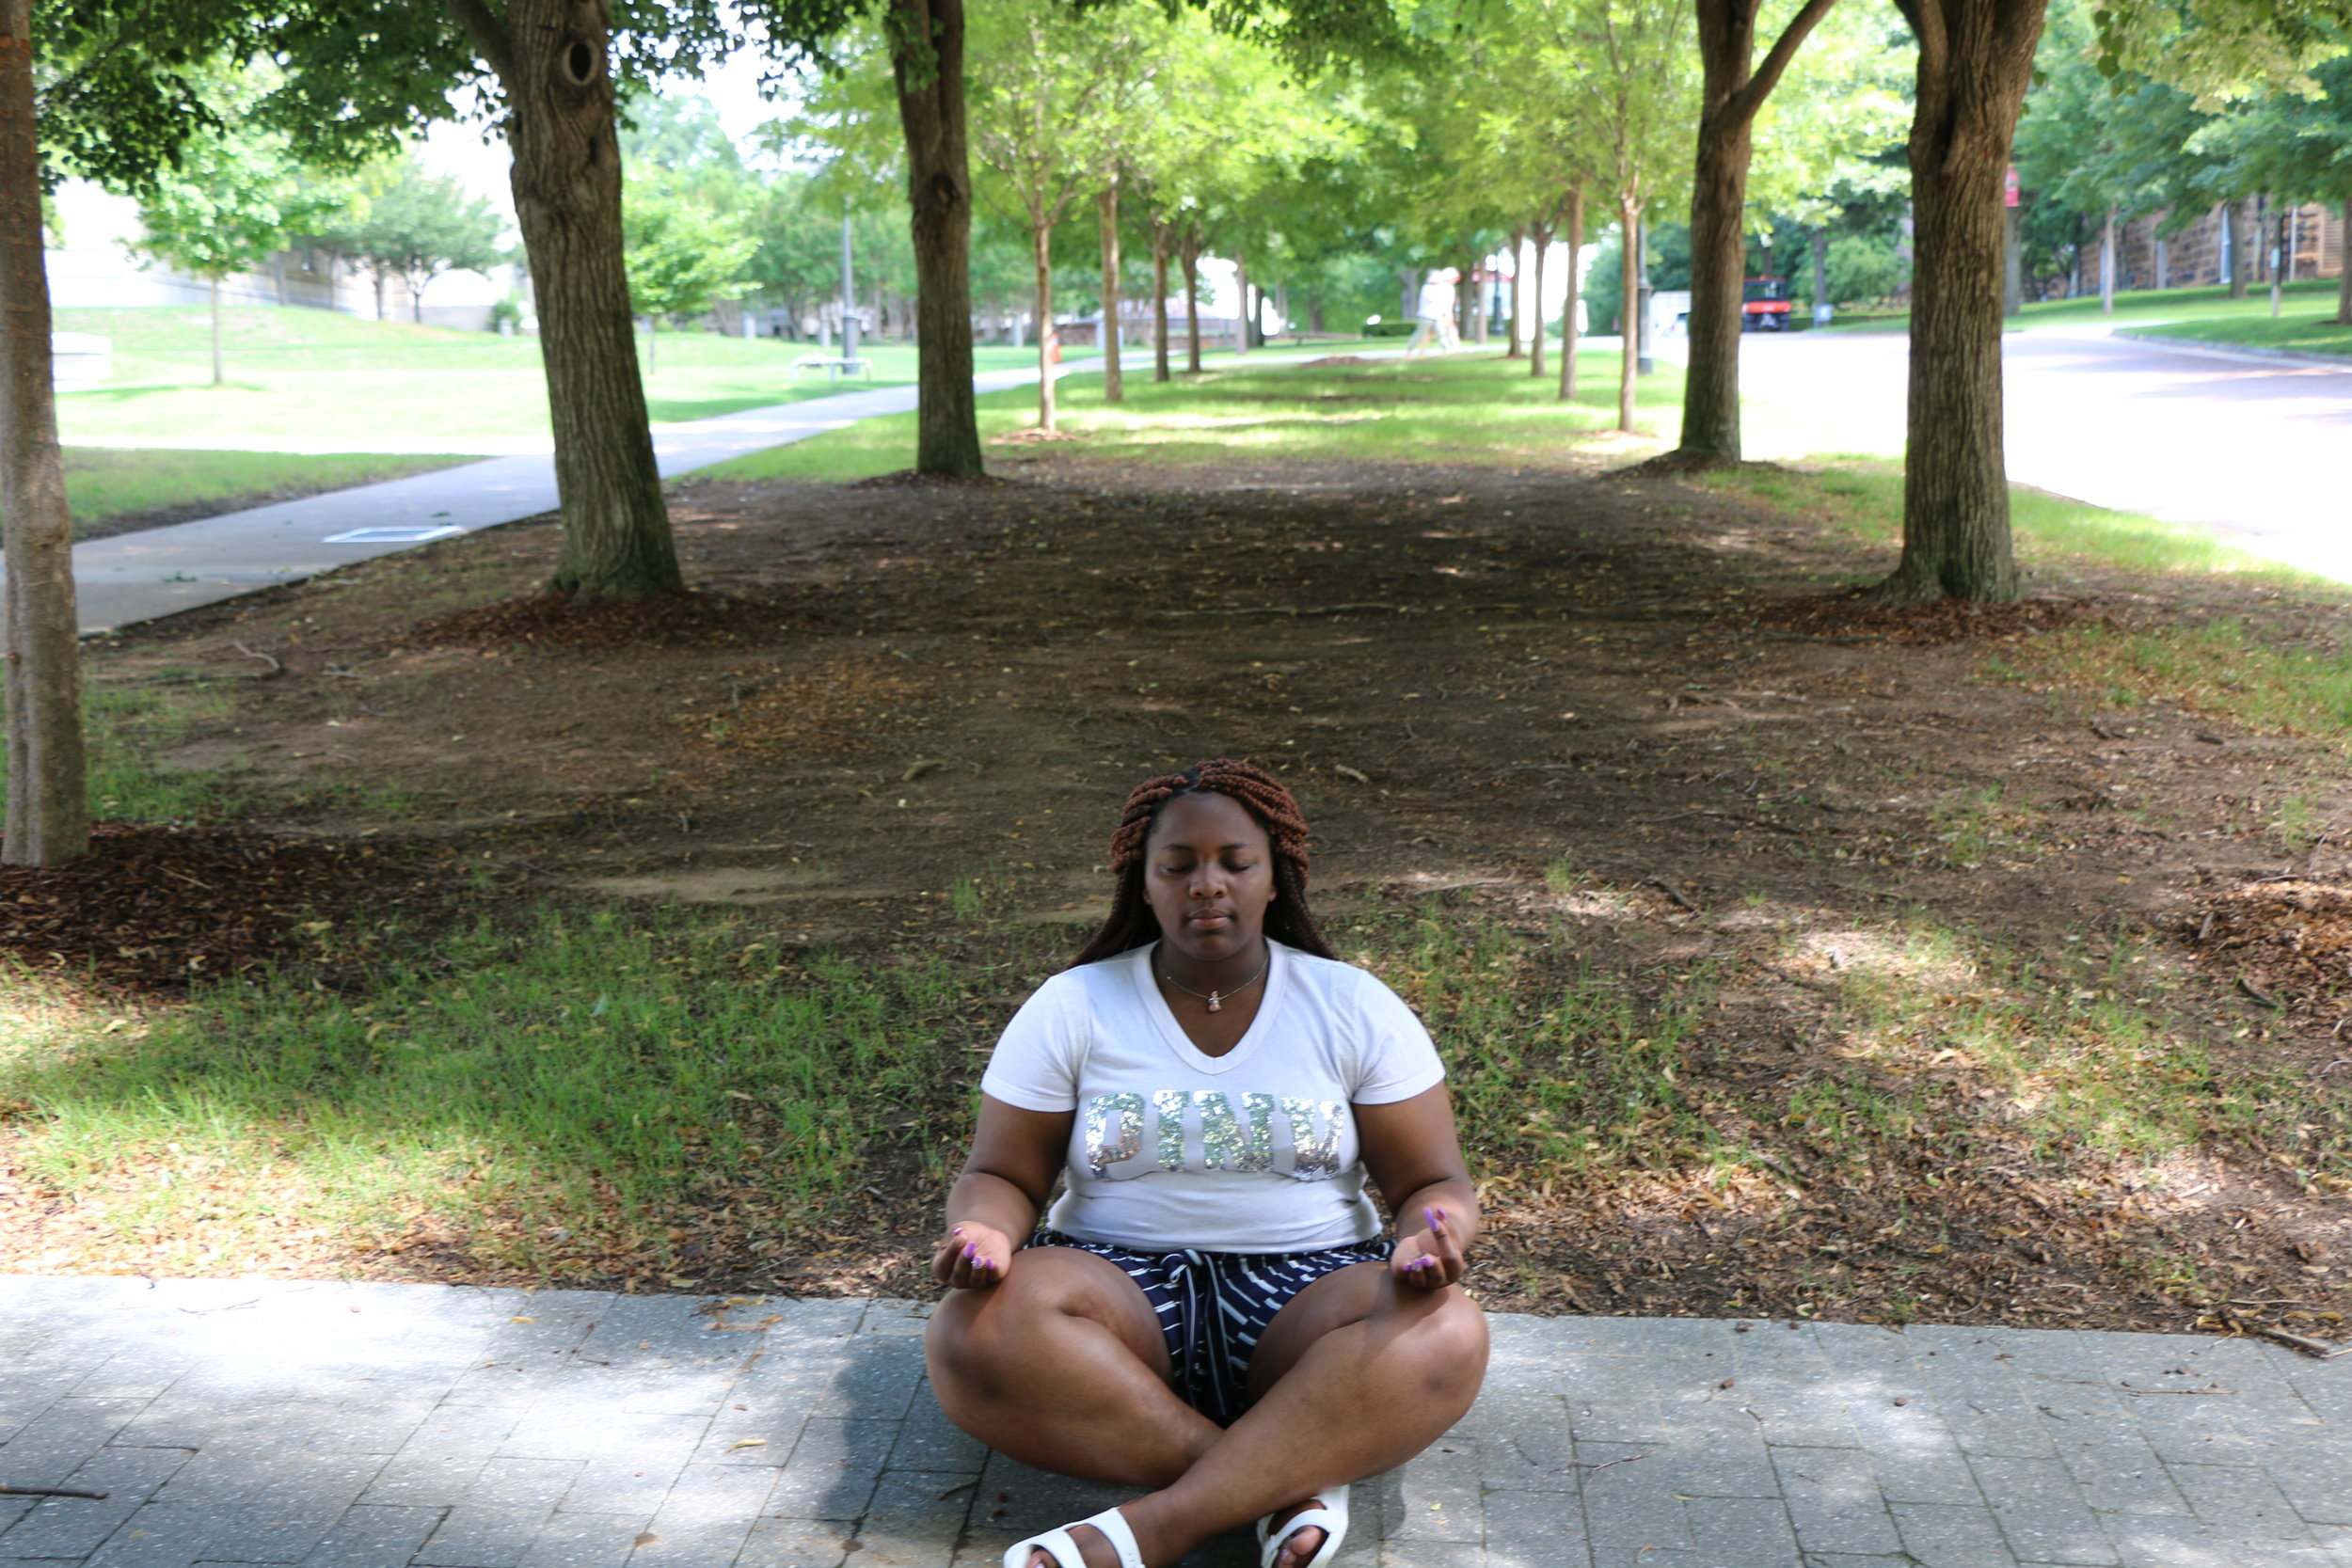 Aaliyah meditating in a Northwest Arkansas park.